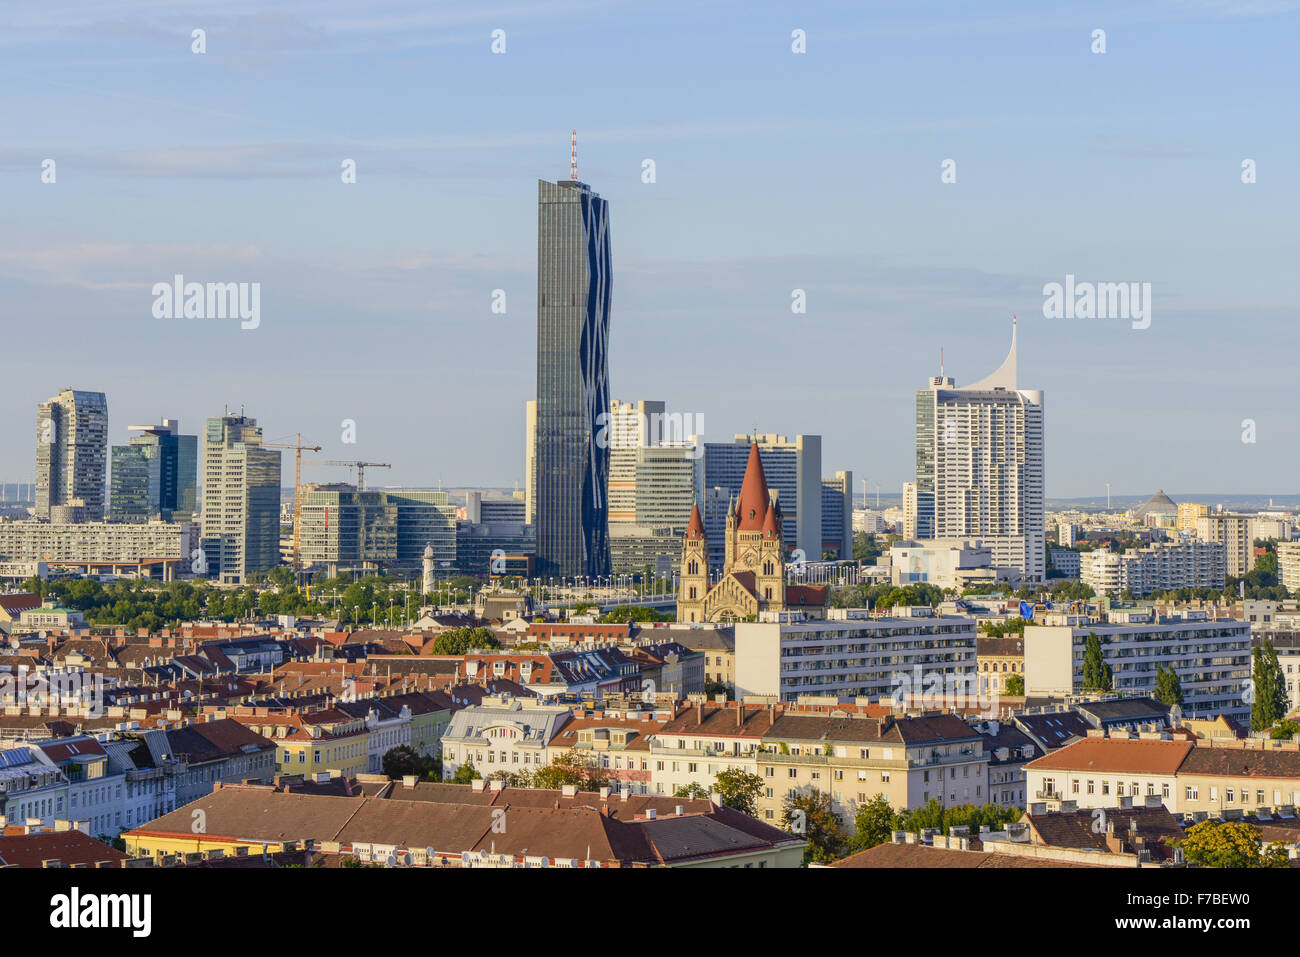 Danube City, Donaucity, DC Tower, Vienna, Austria Stock Photo